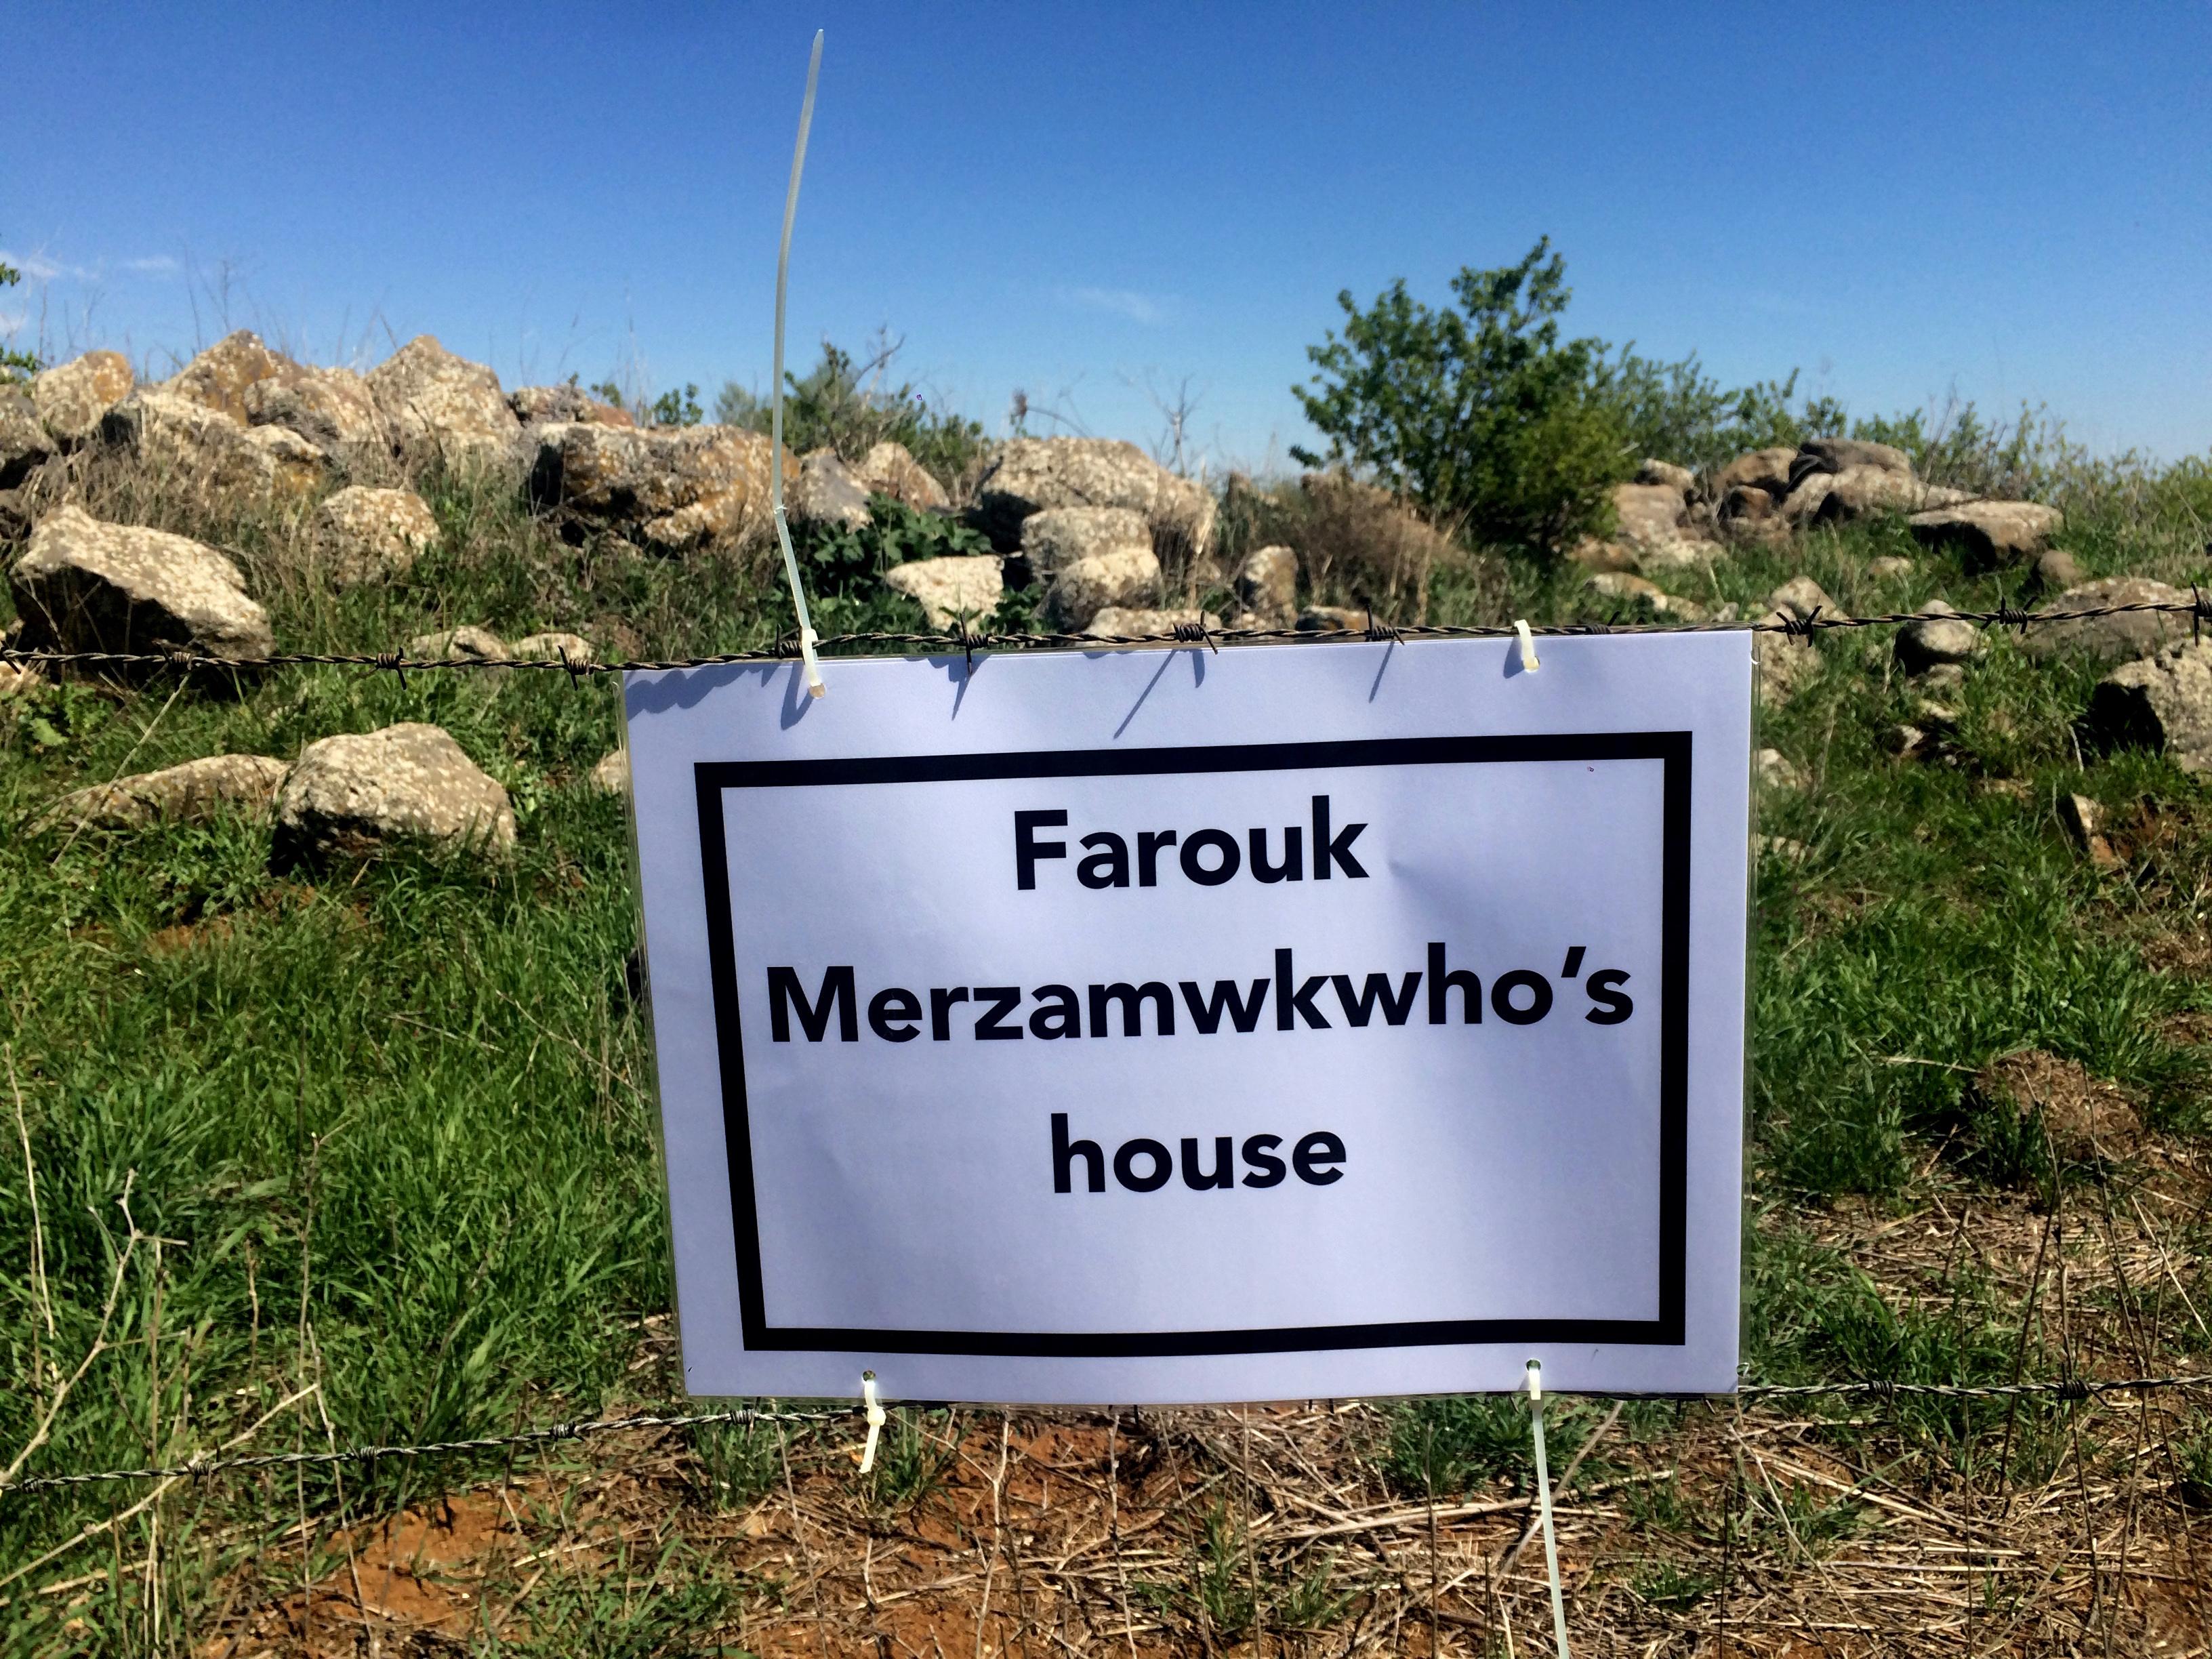 Signing Farouk's house